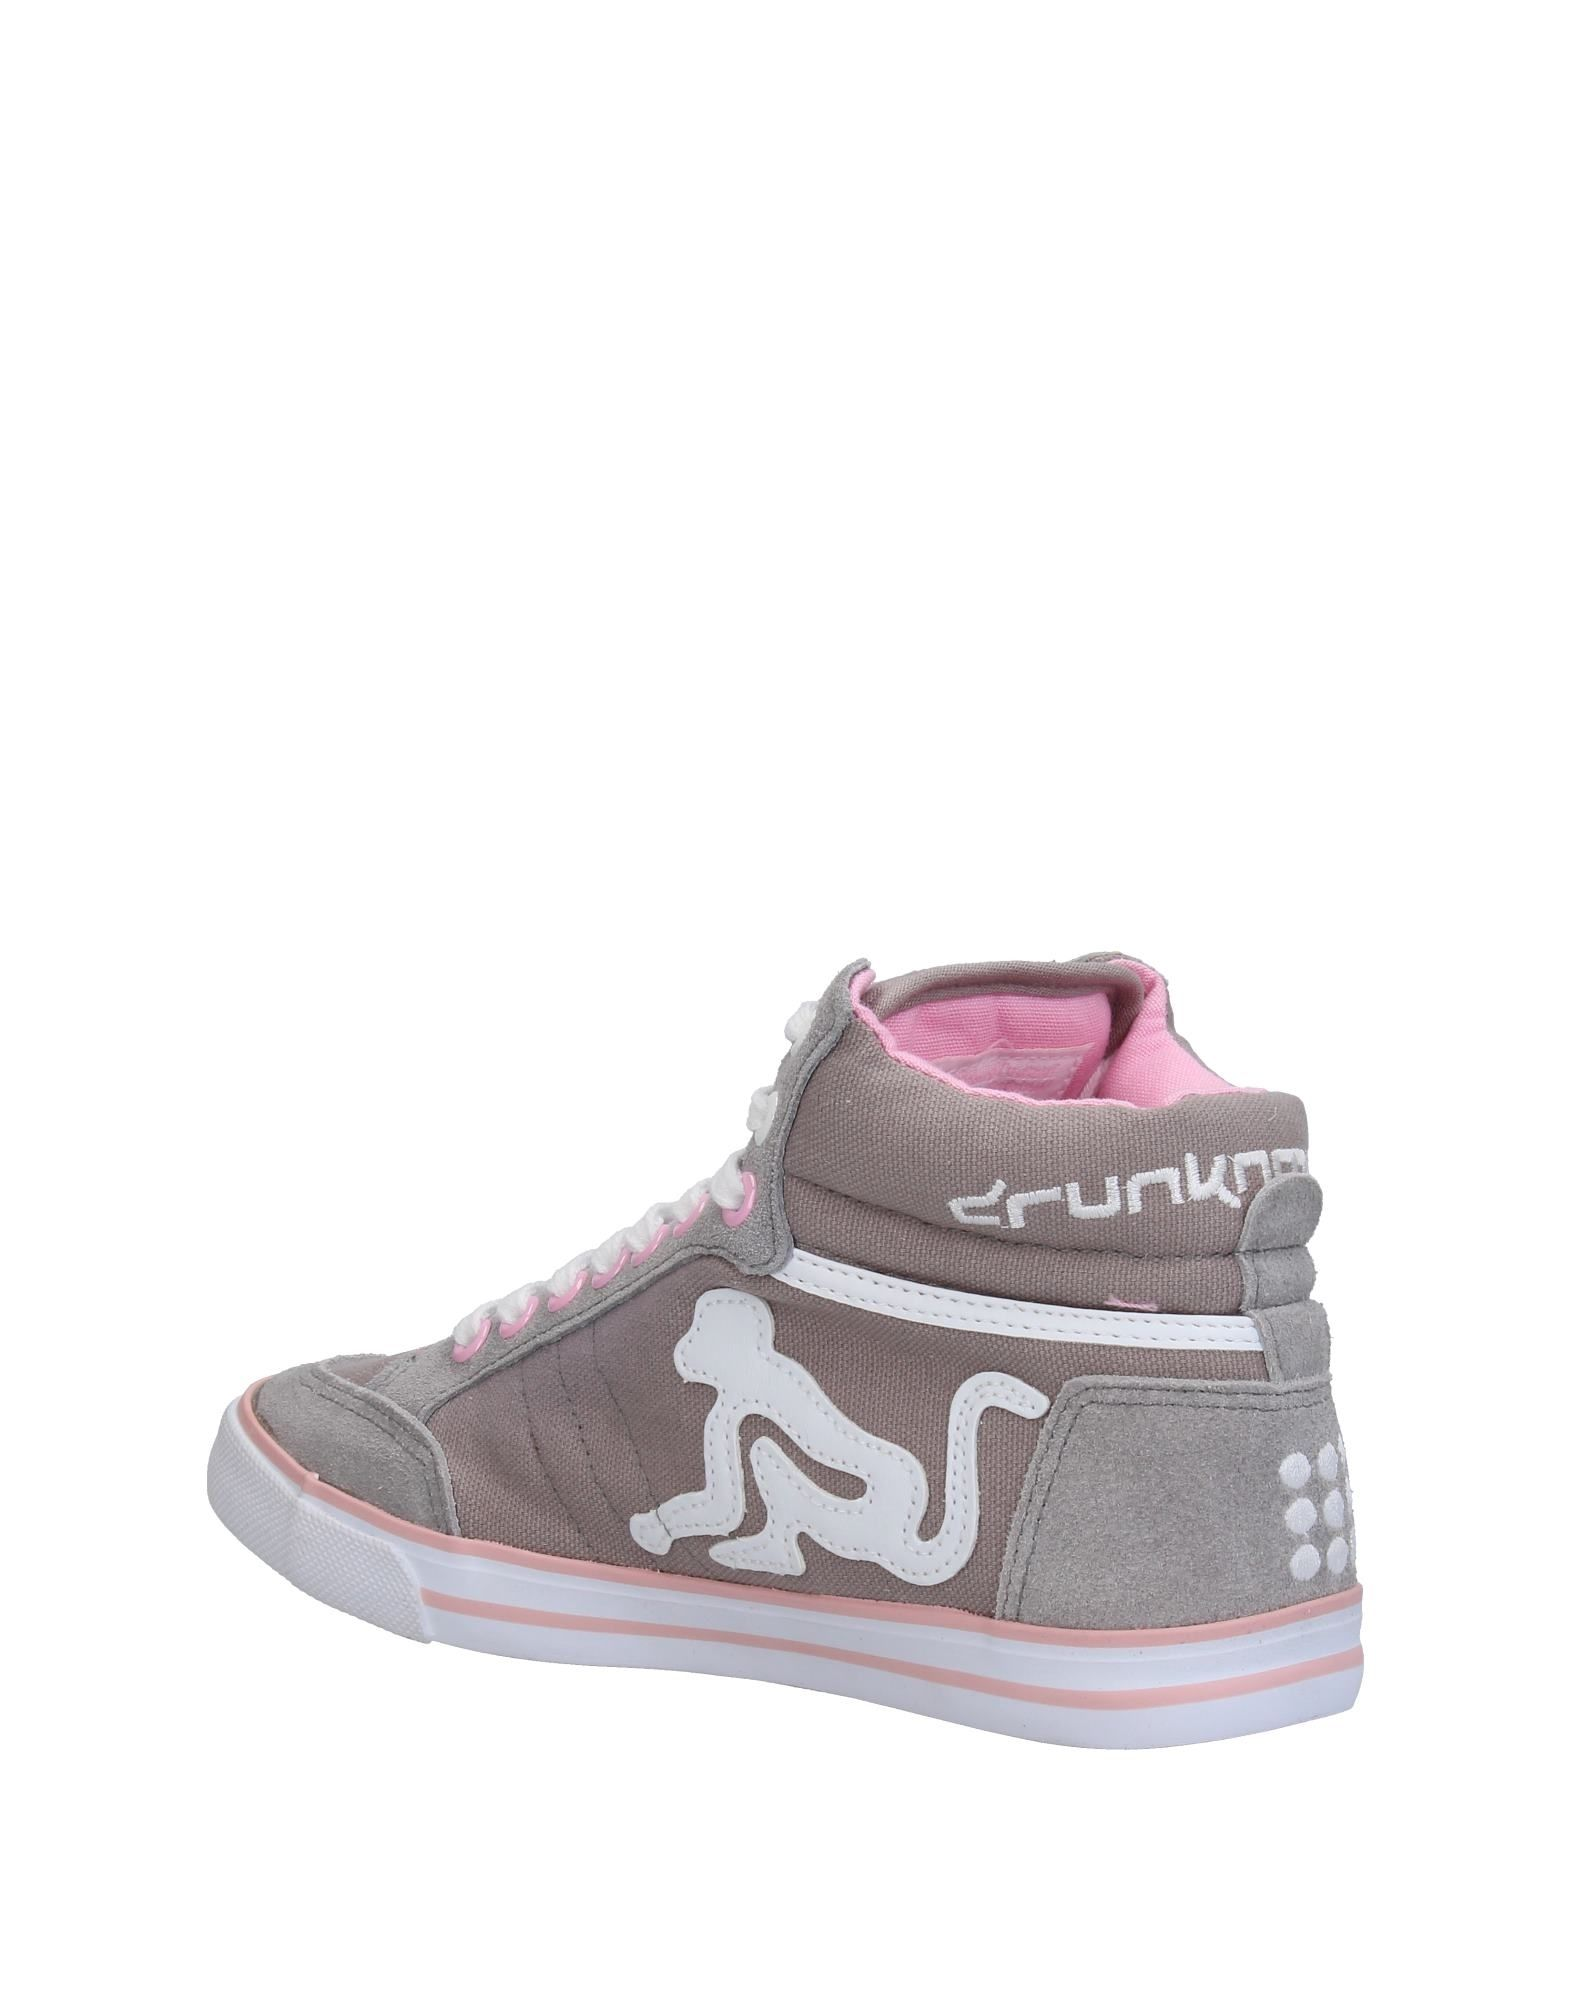 Sneakers Drunknmunky Femme - Sneakers Drunknmunky sur